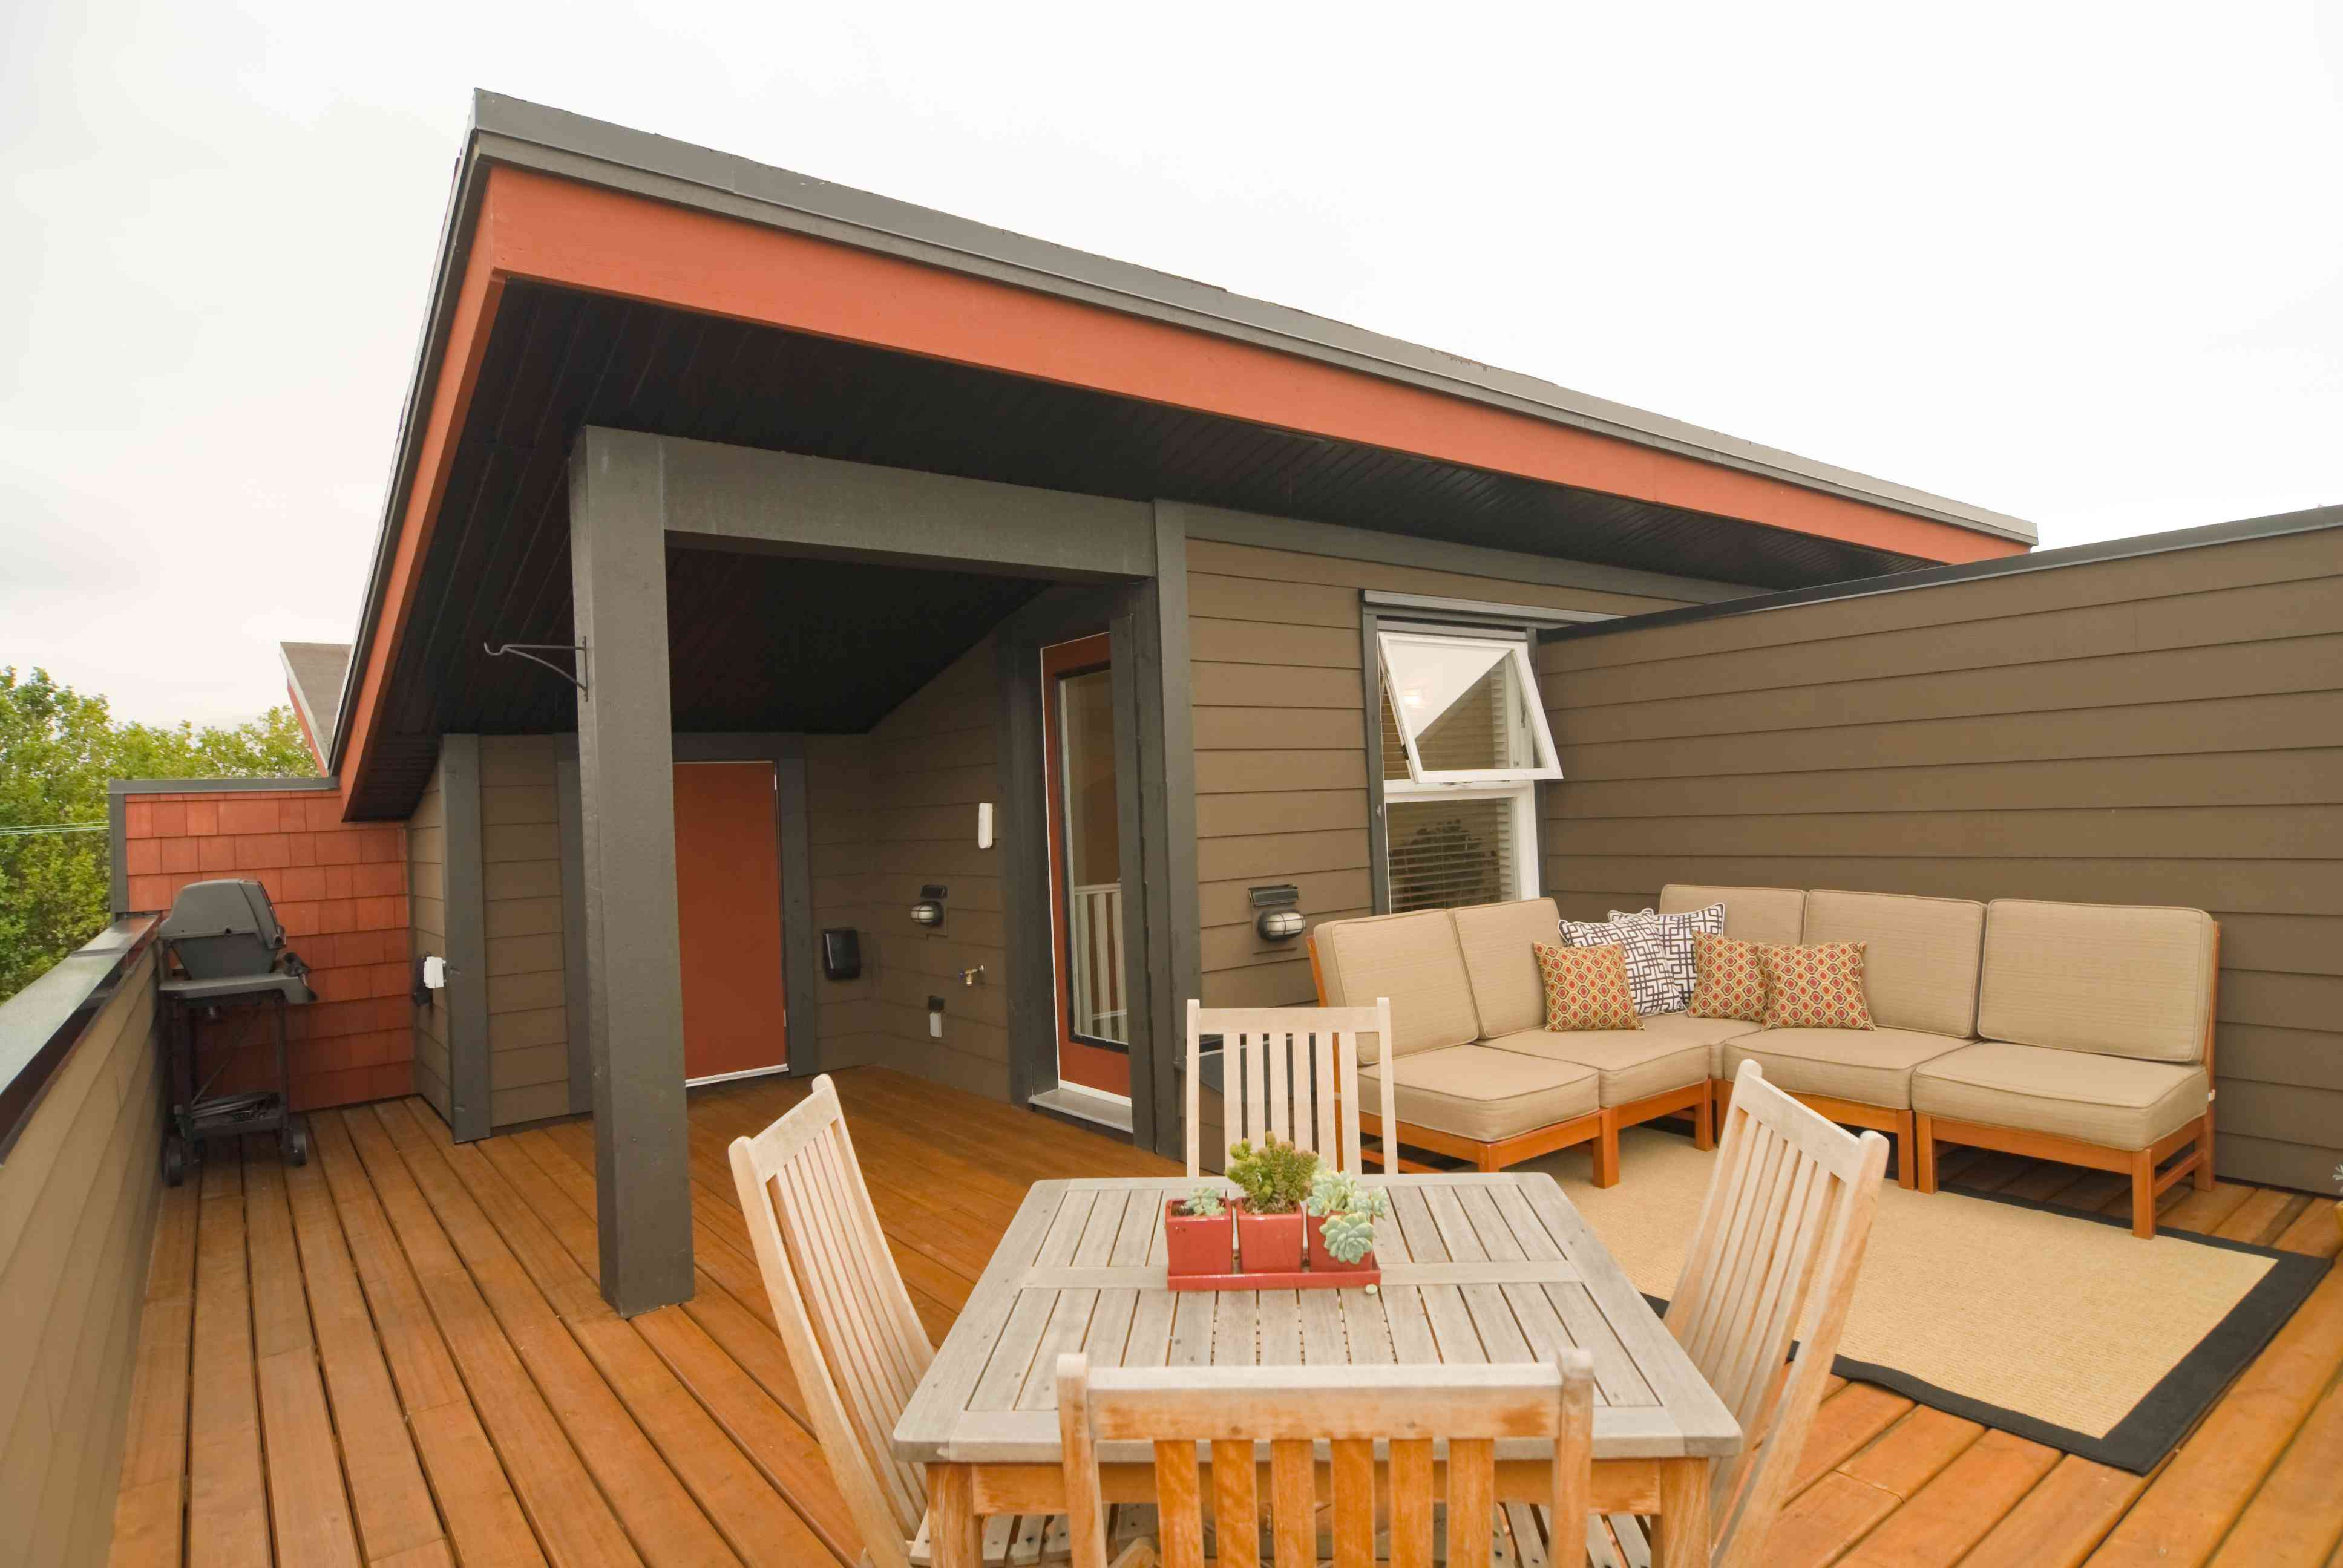 Designer Apartment Rooftop Deck